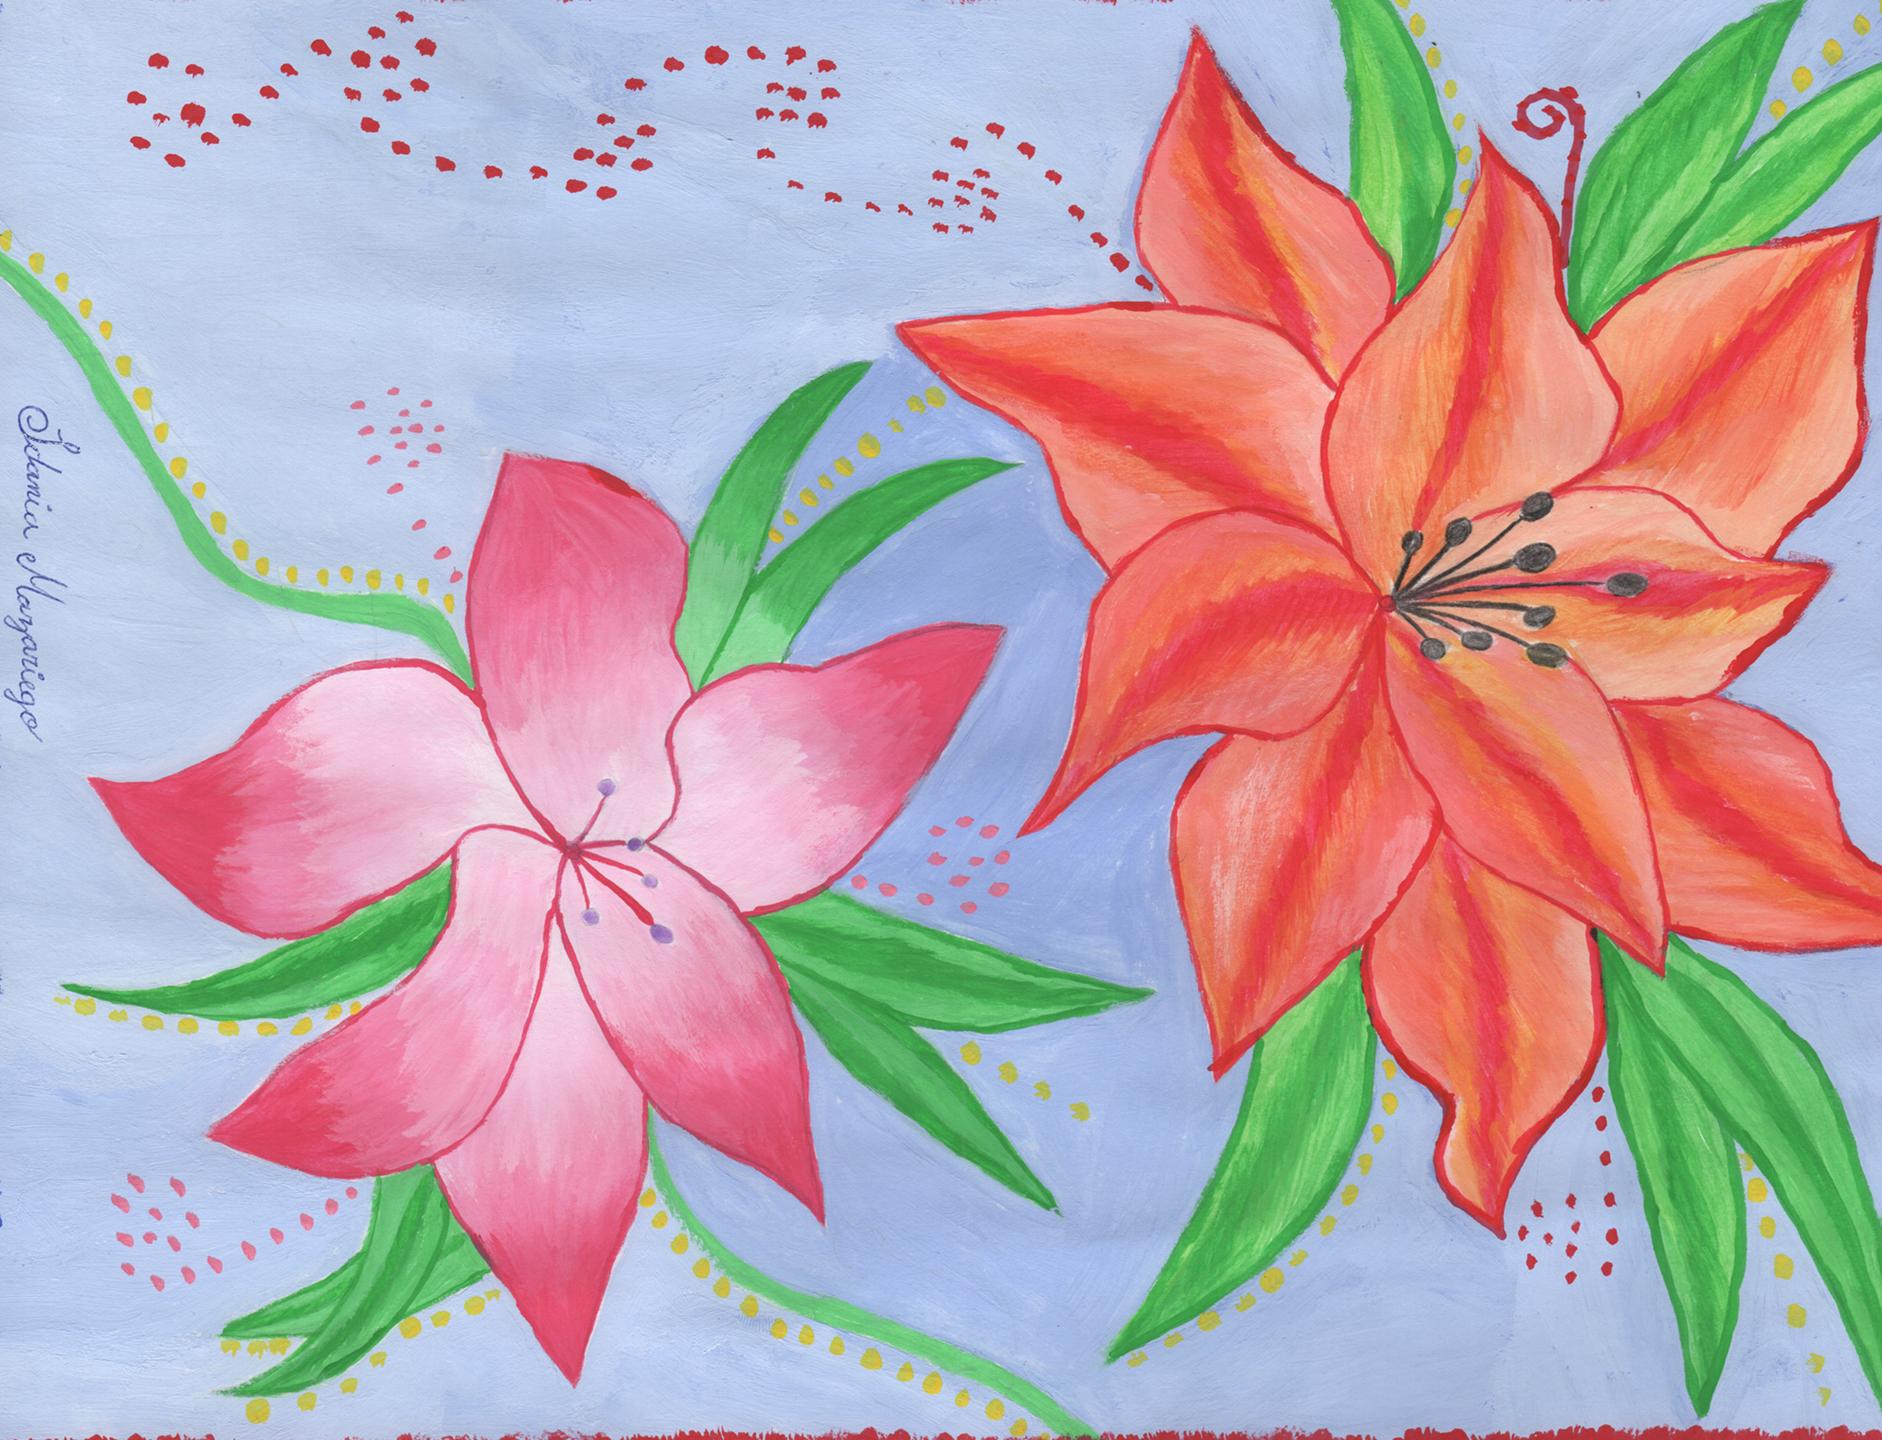 Flower_IdaniaM_01